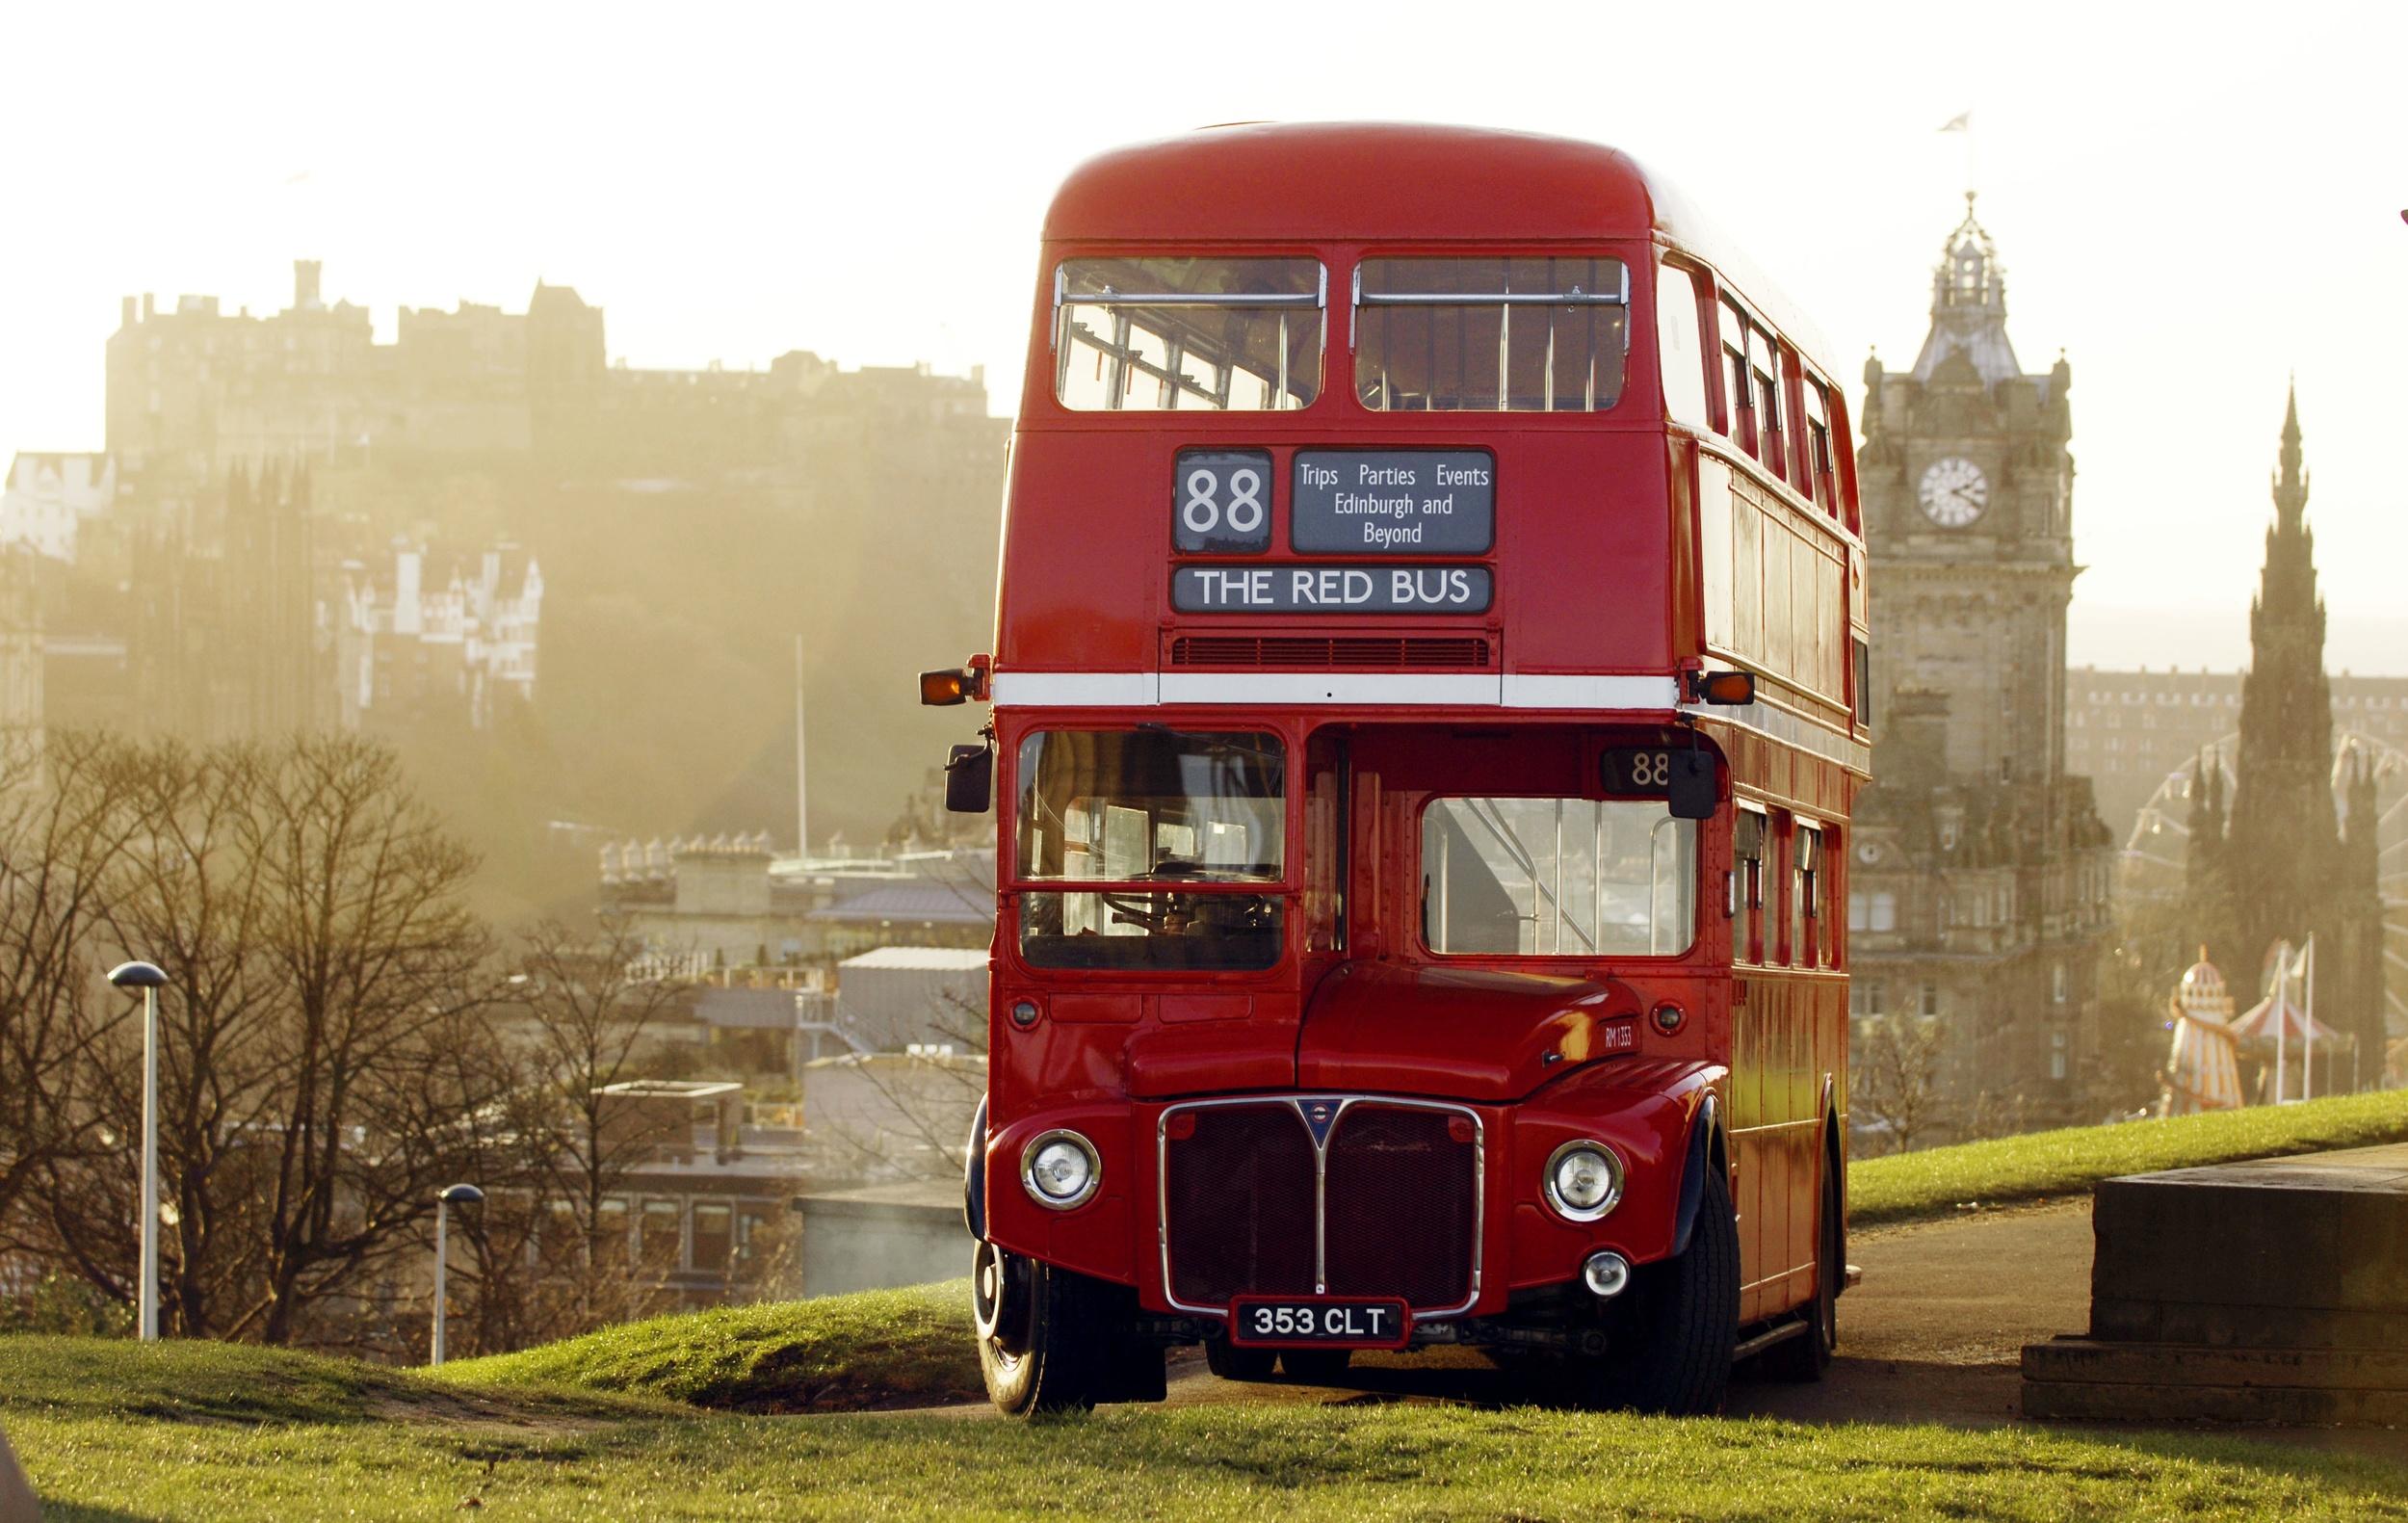 THE BIG RED BUS - EDINBURGH